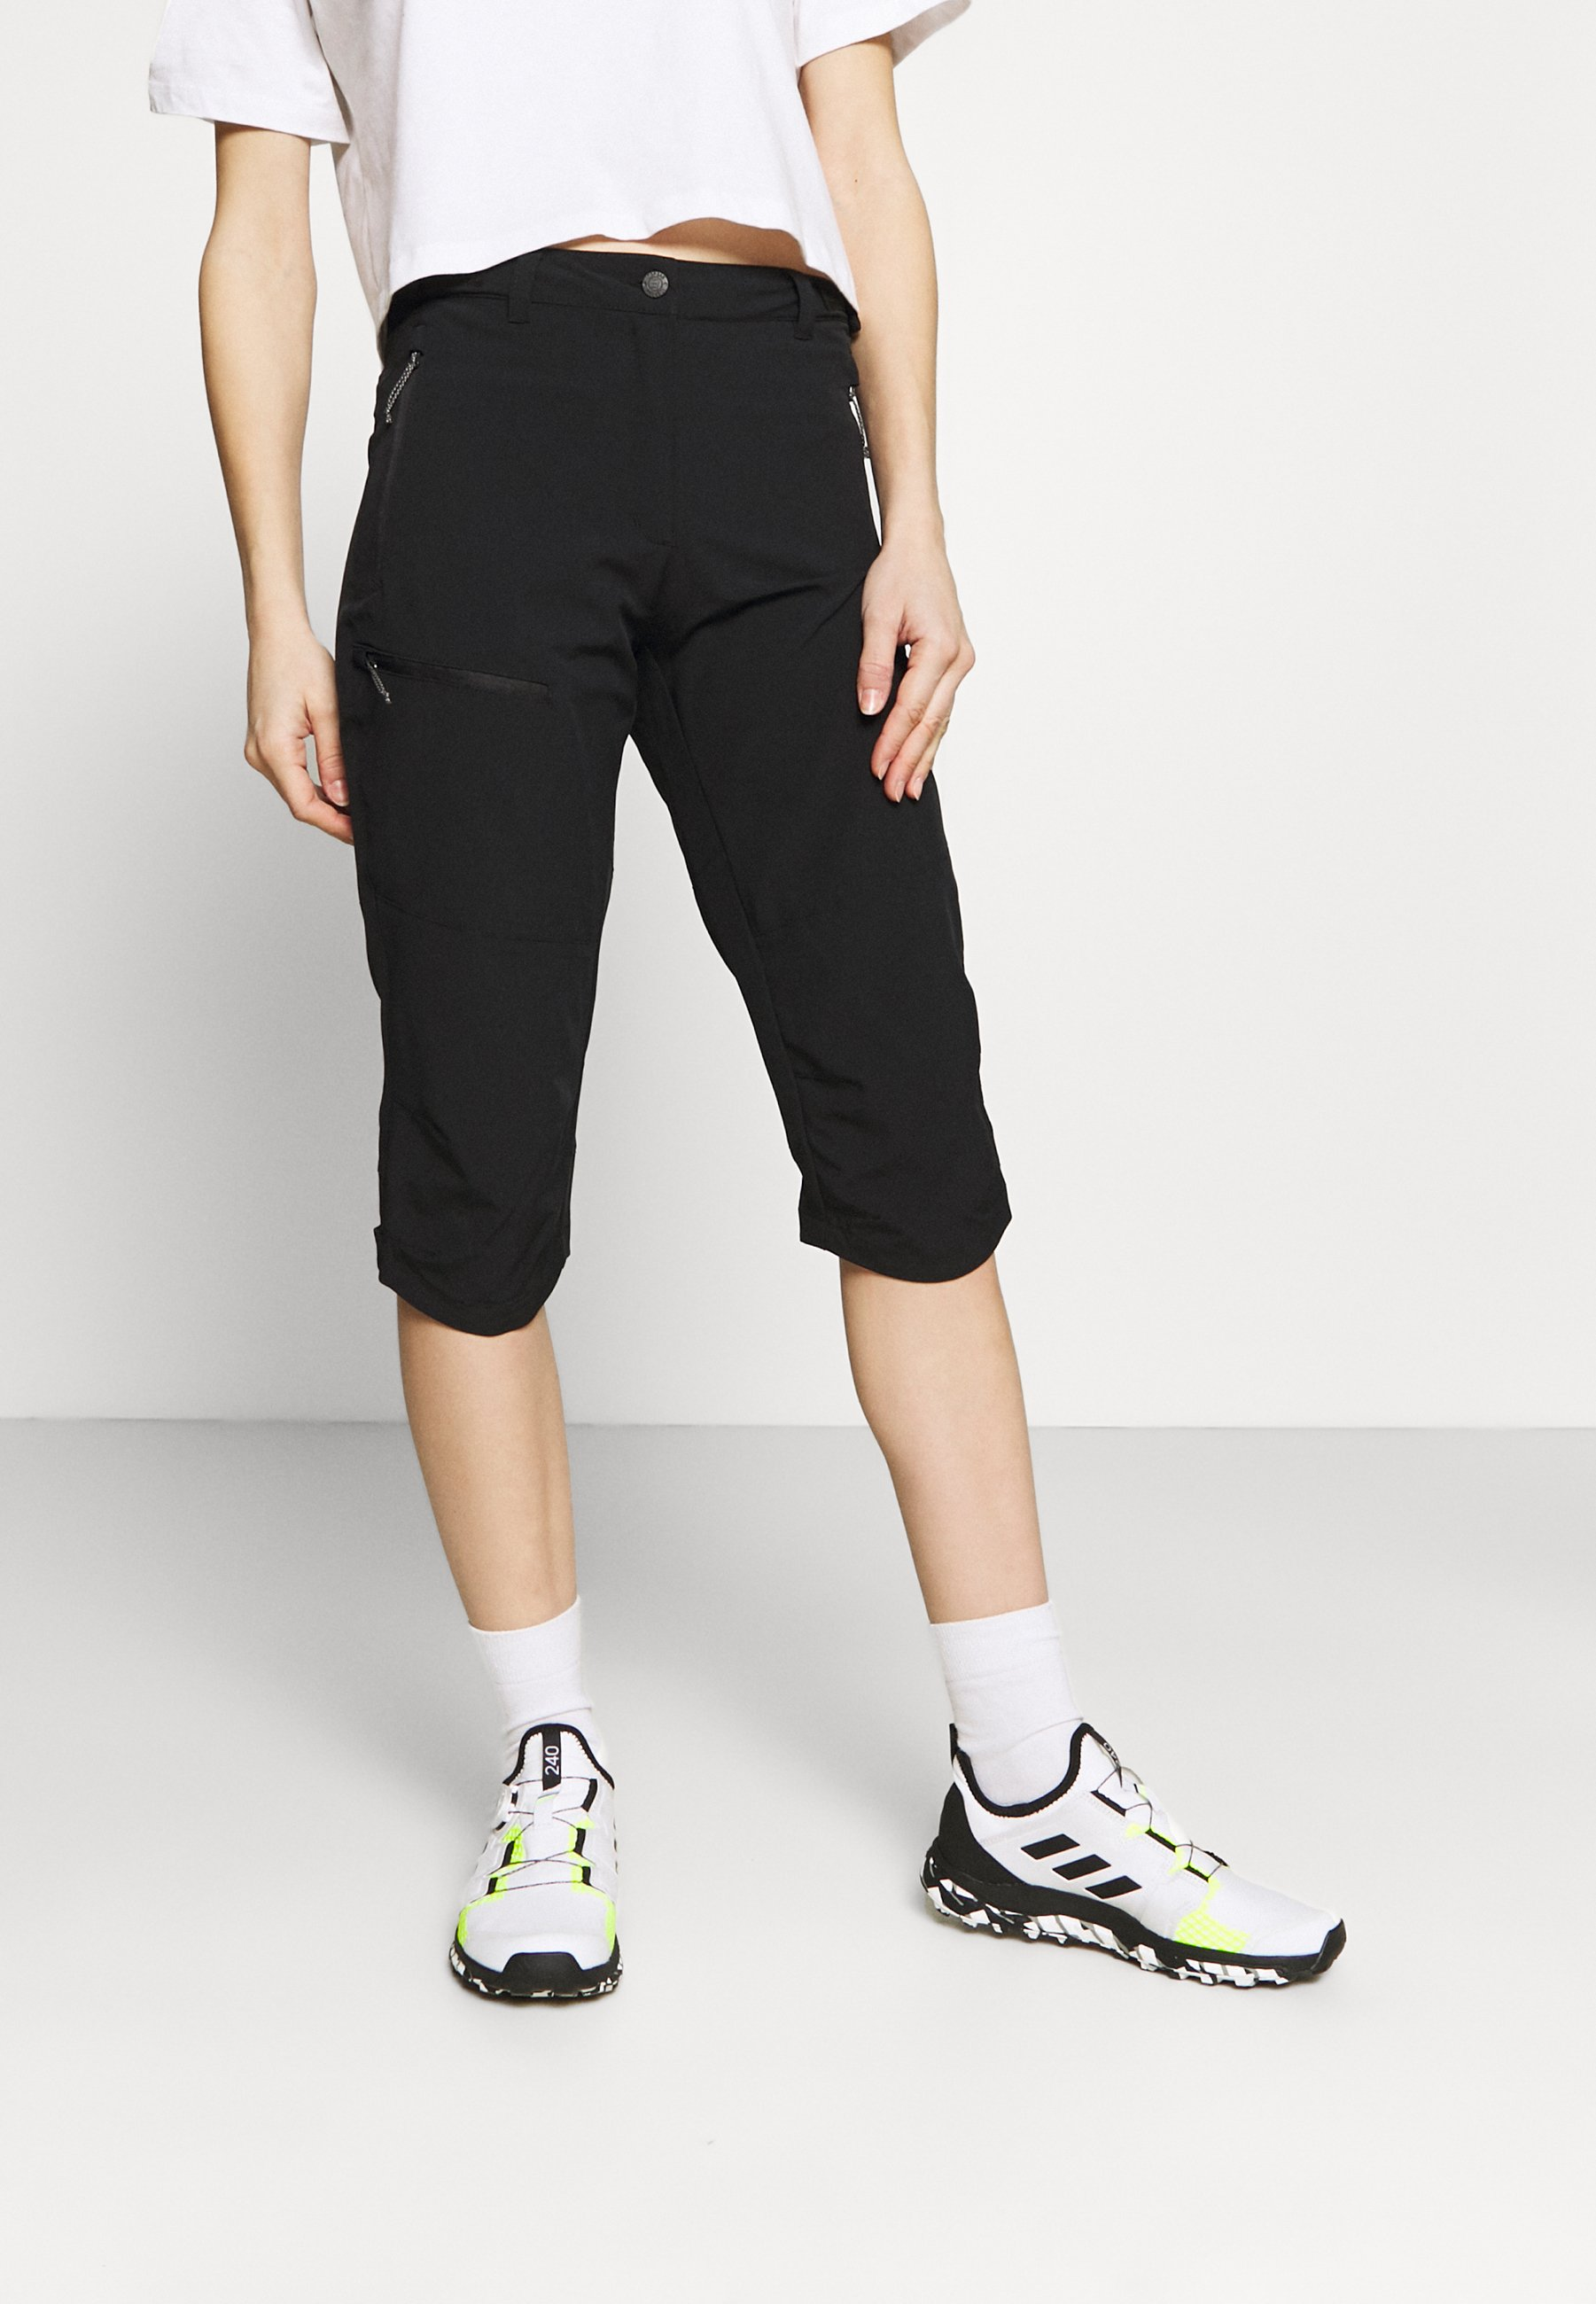 Damen BEATTIE - 3/4 Sporthose